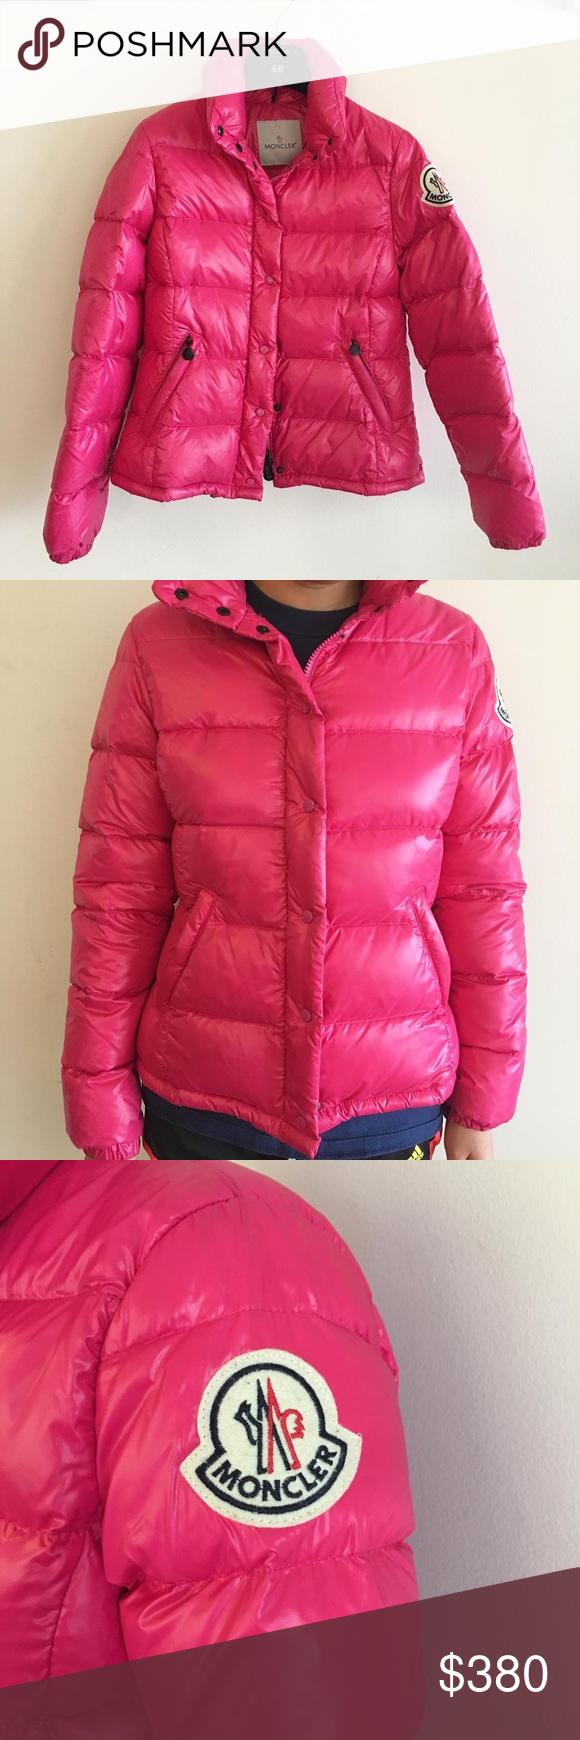 ec7c70f2a Moncler Vintage Claire Hot Pink Jacket Only worn twice Moncler ...